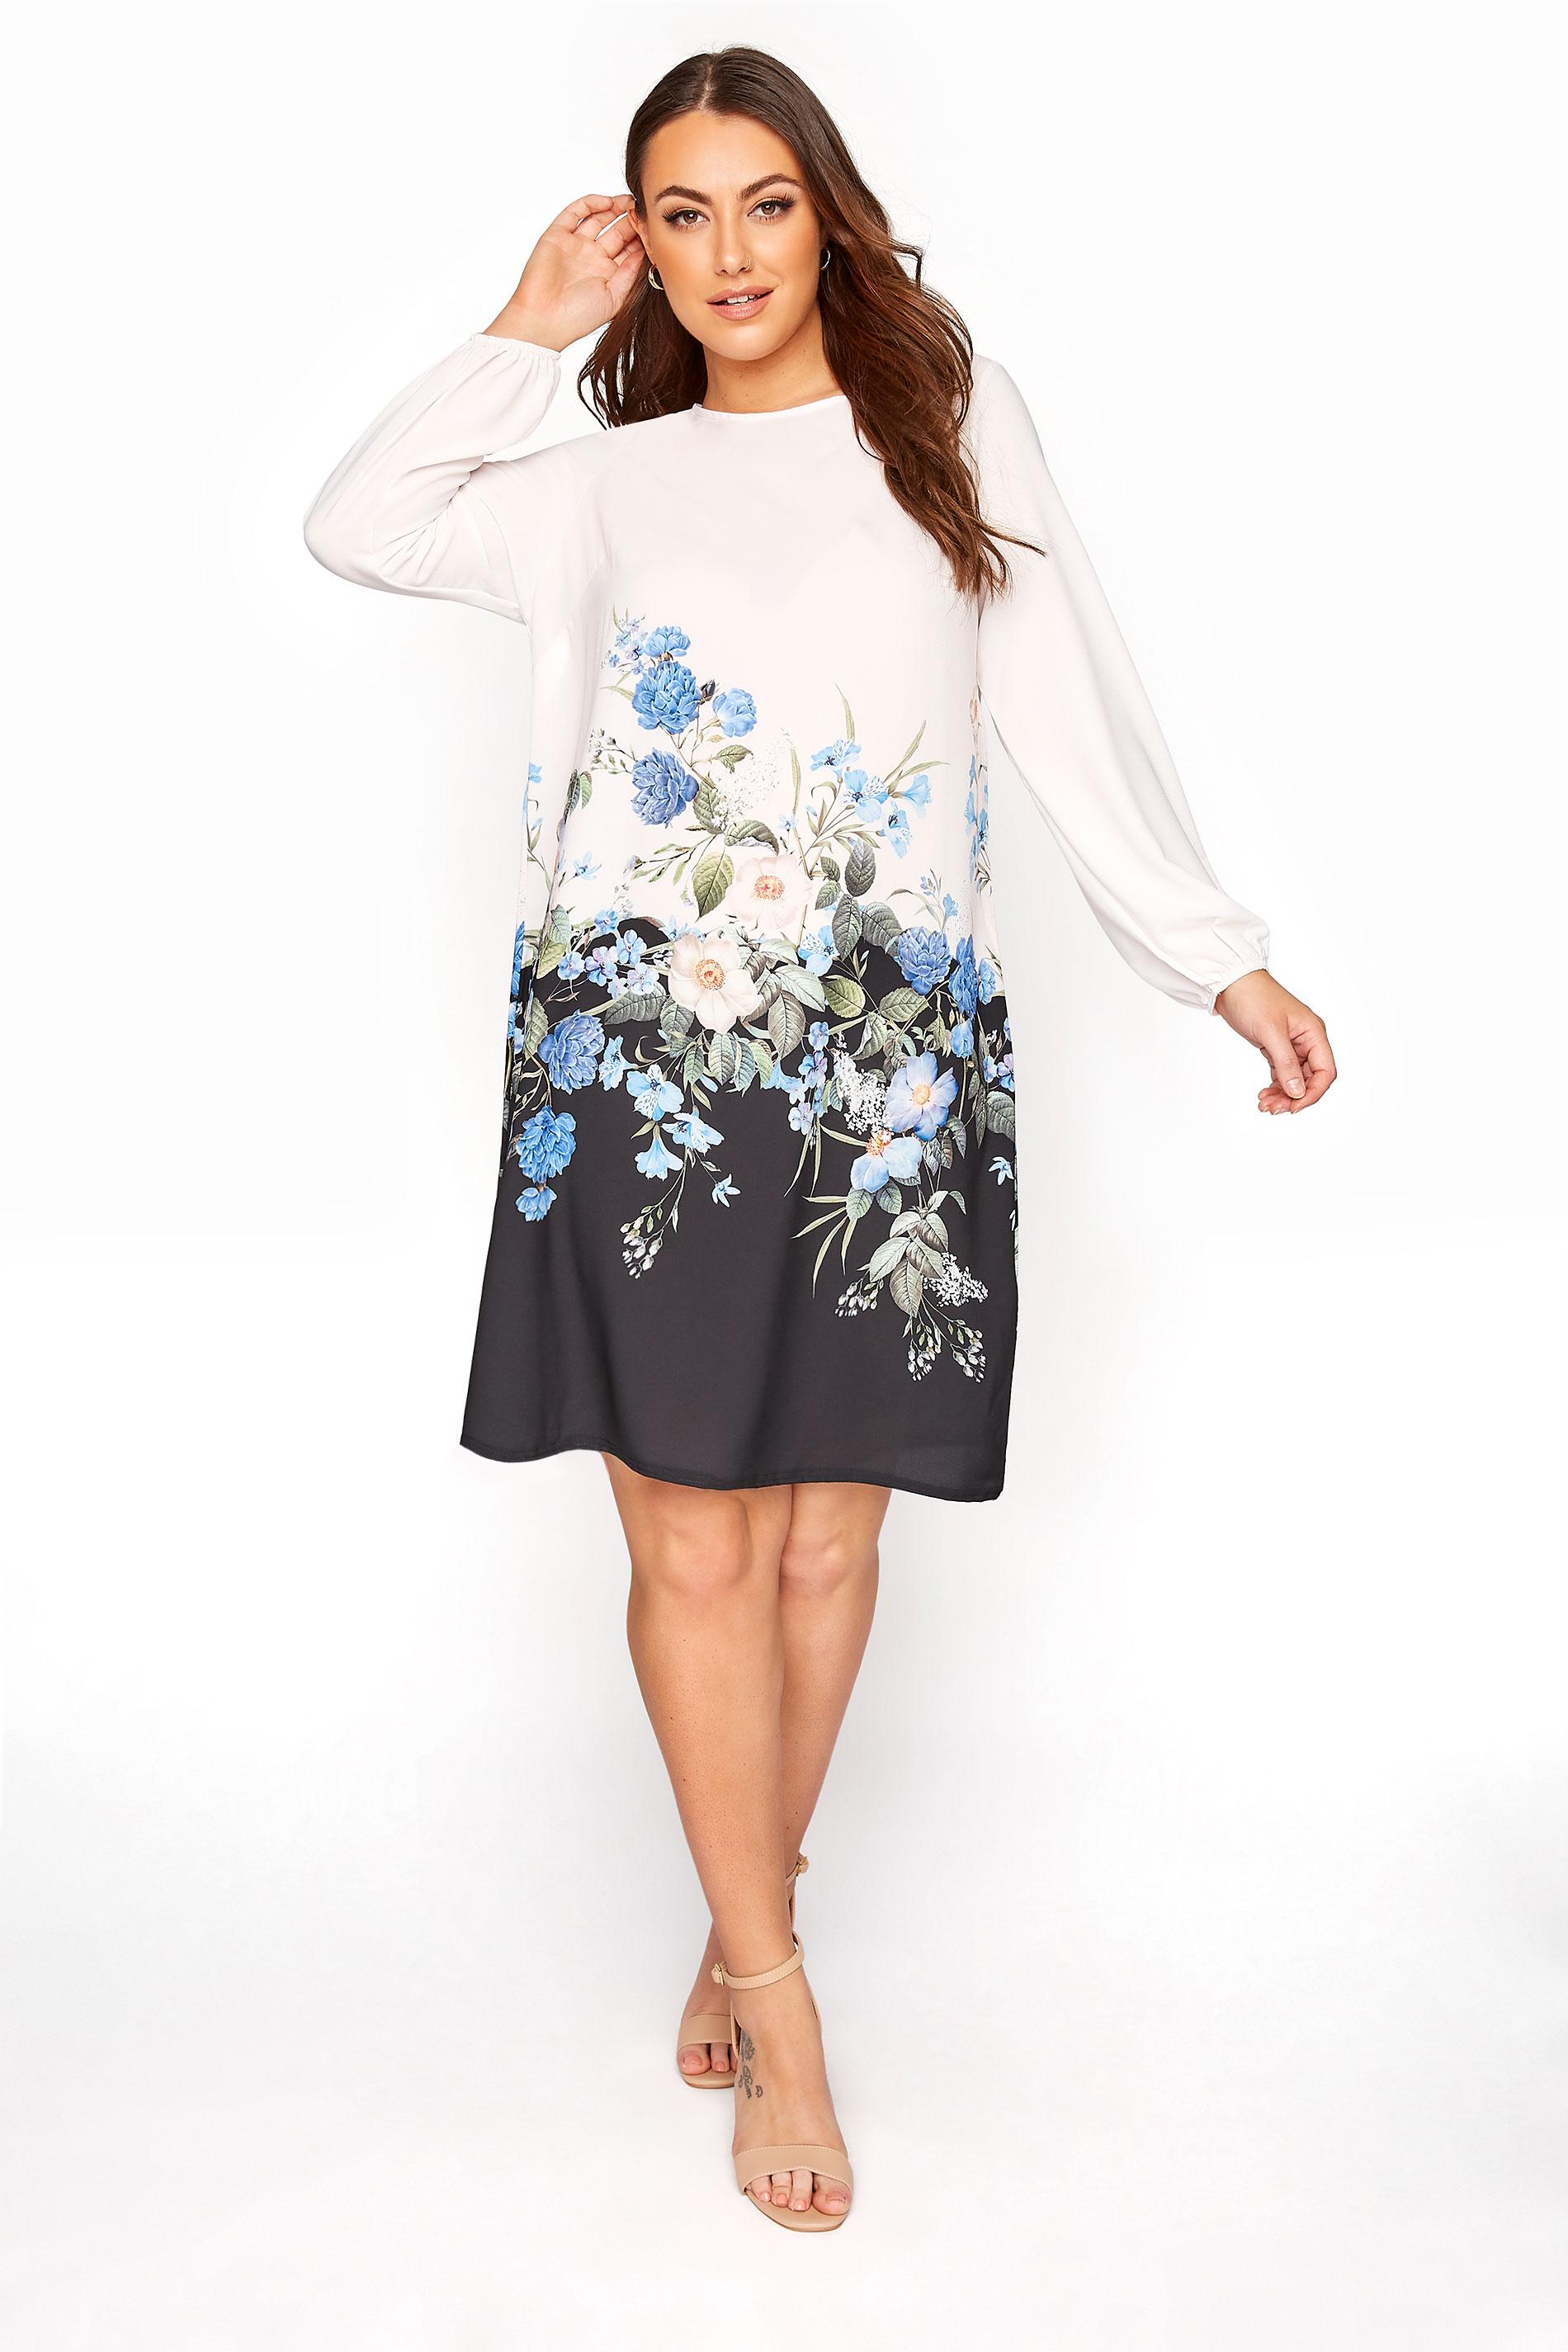 YOURS LONDON White Floral Border Shift Dress